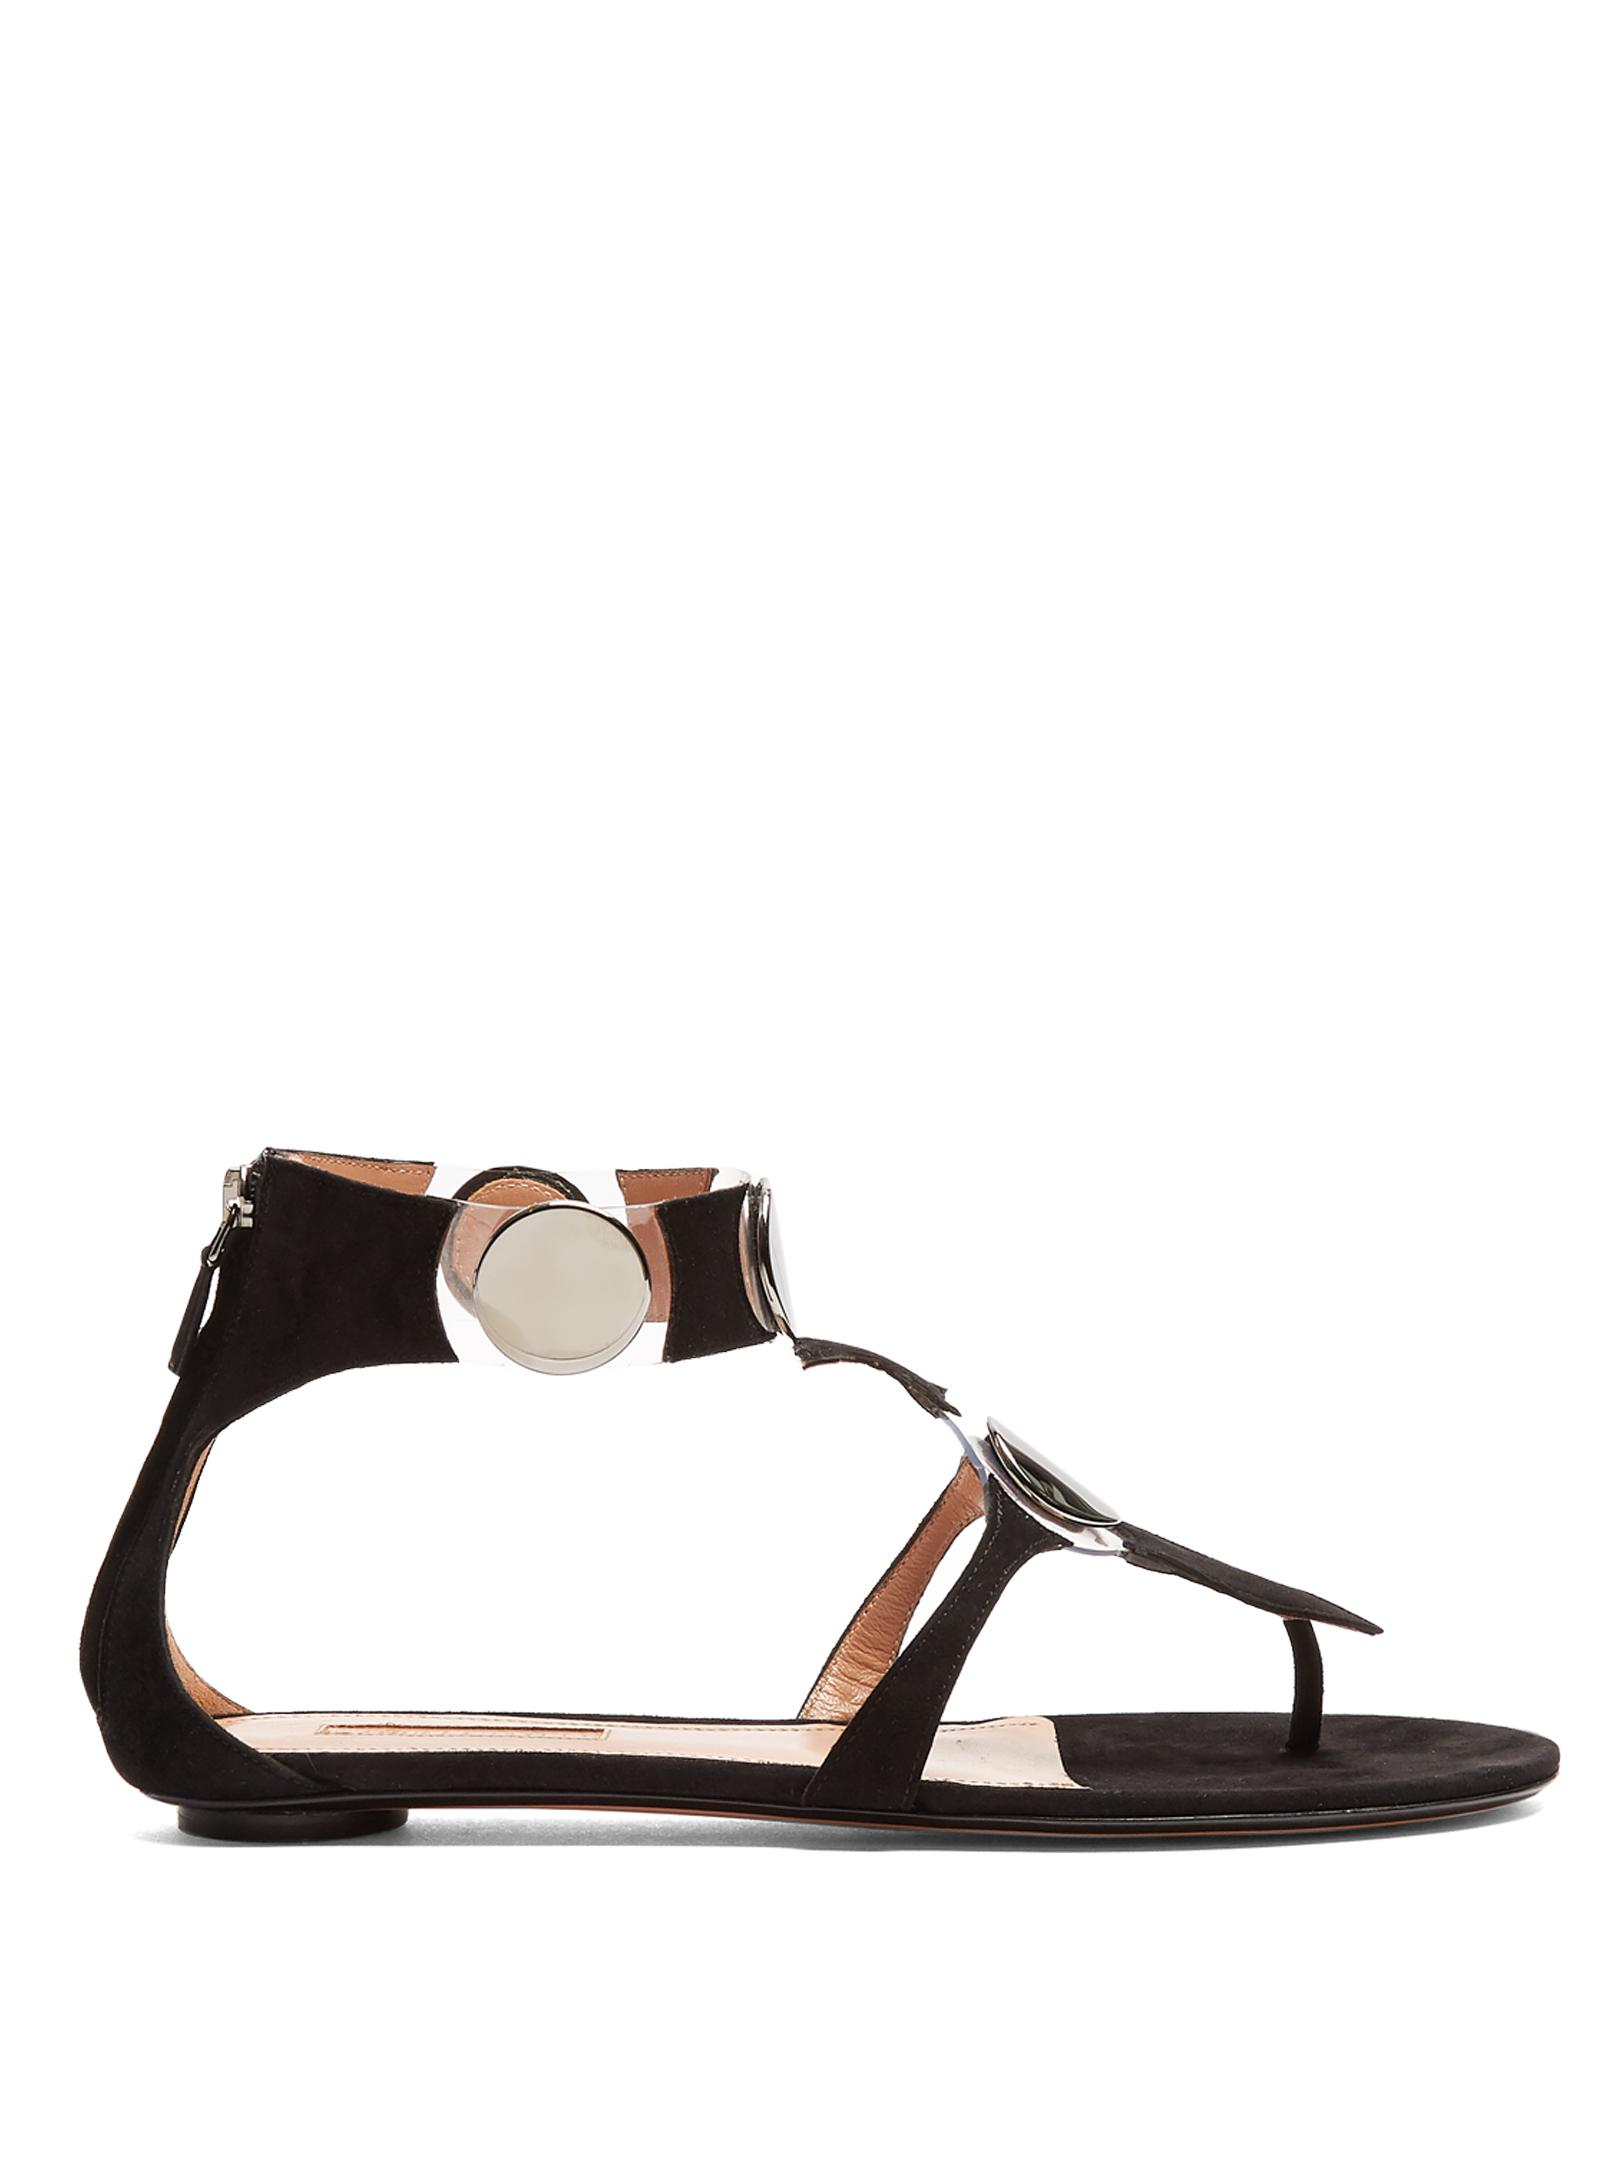 Sandales Post Orteils Samuele - Failli Chaussures B5n1UWb8i